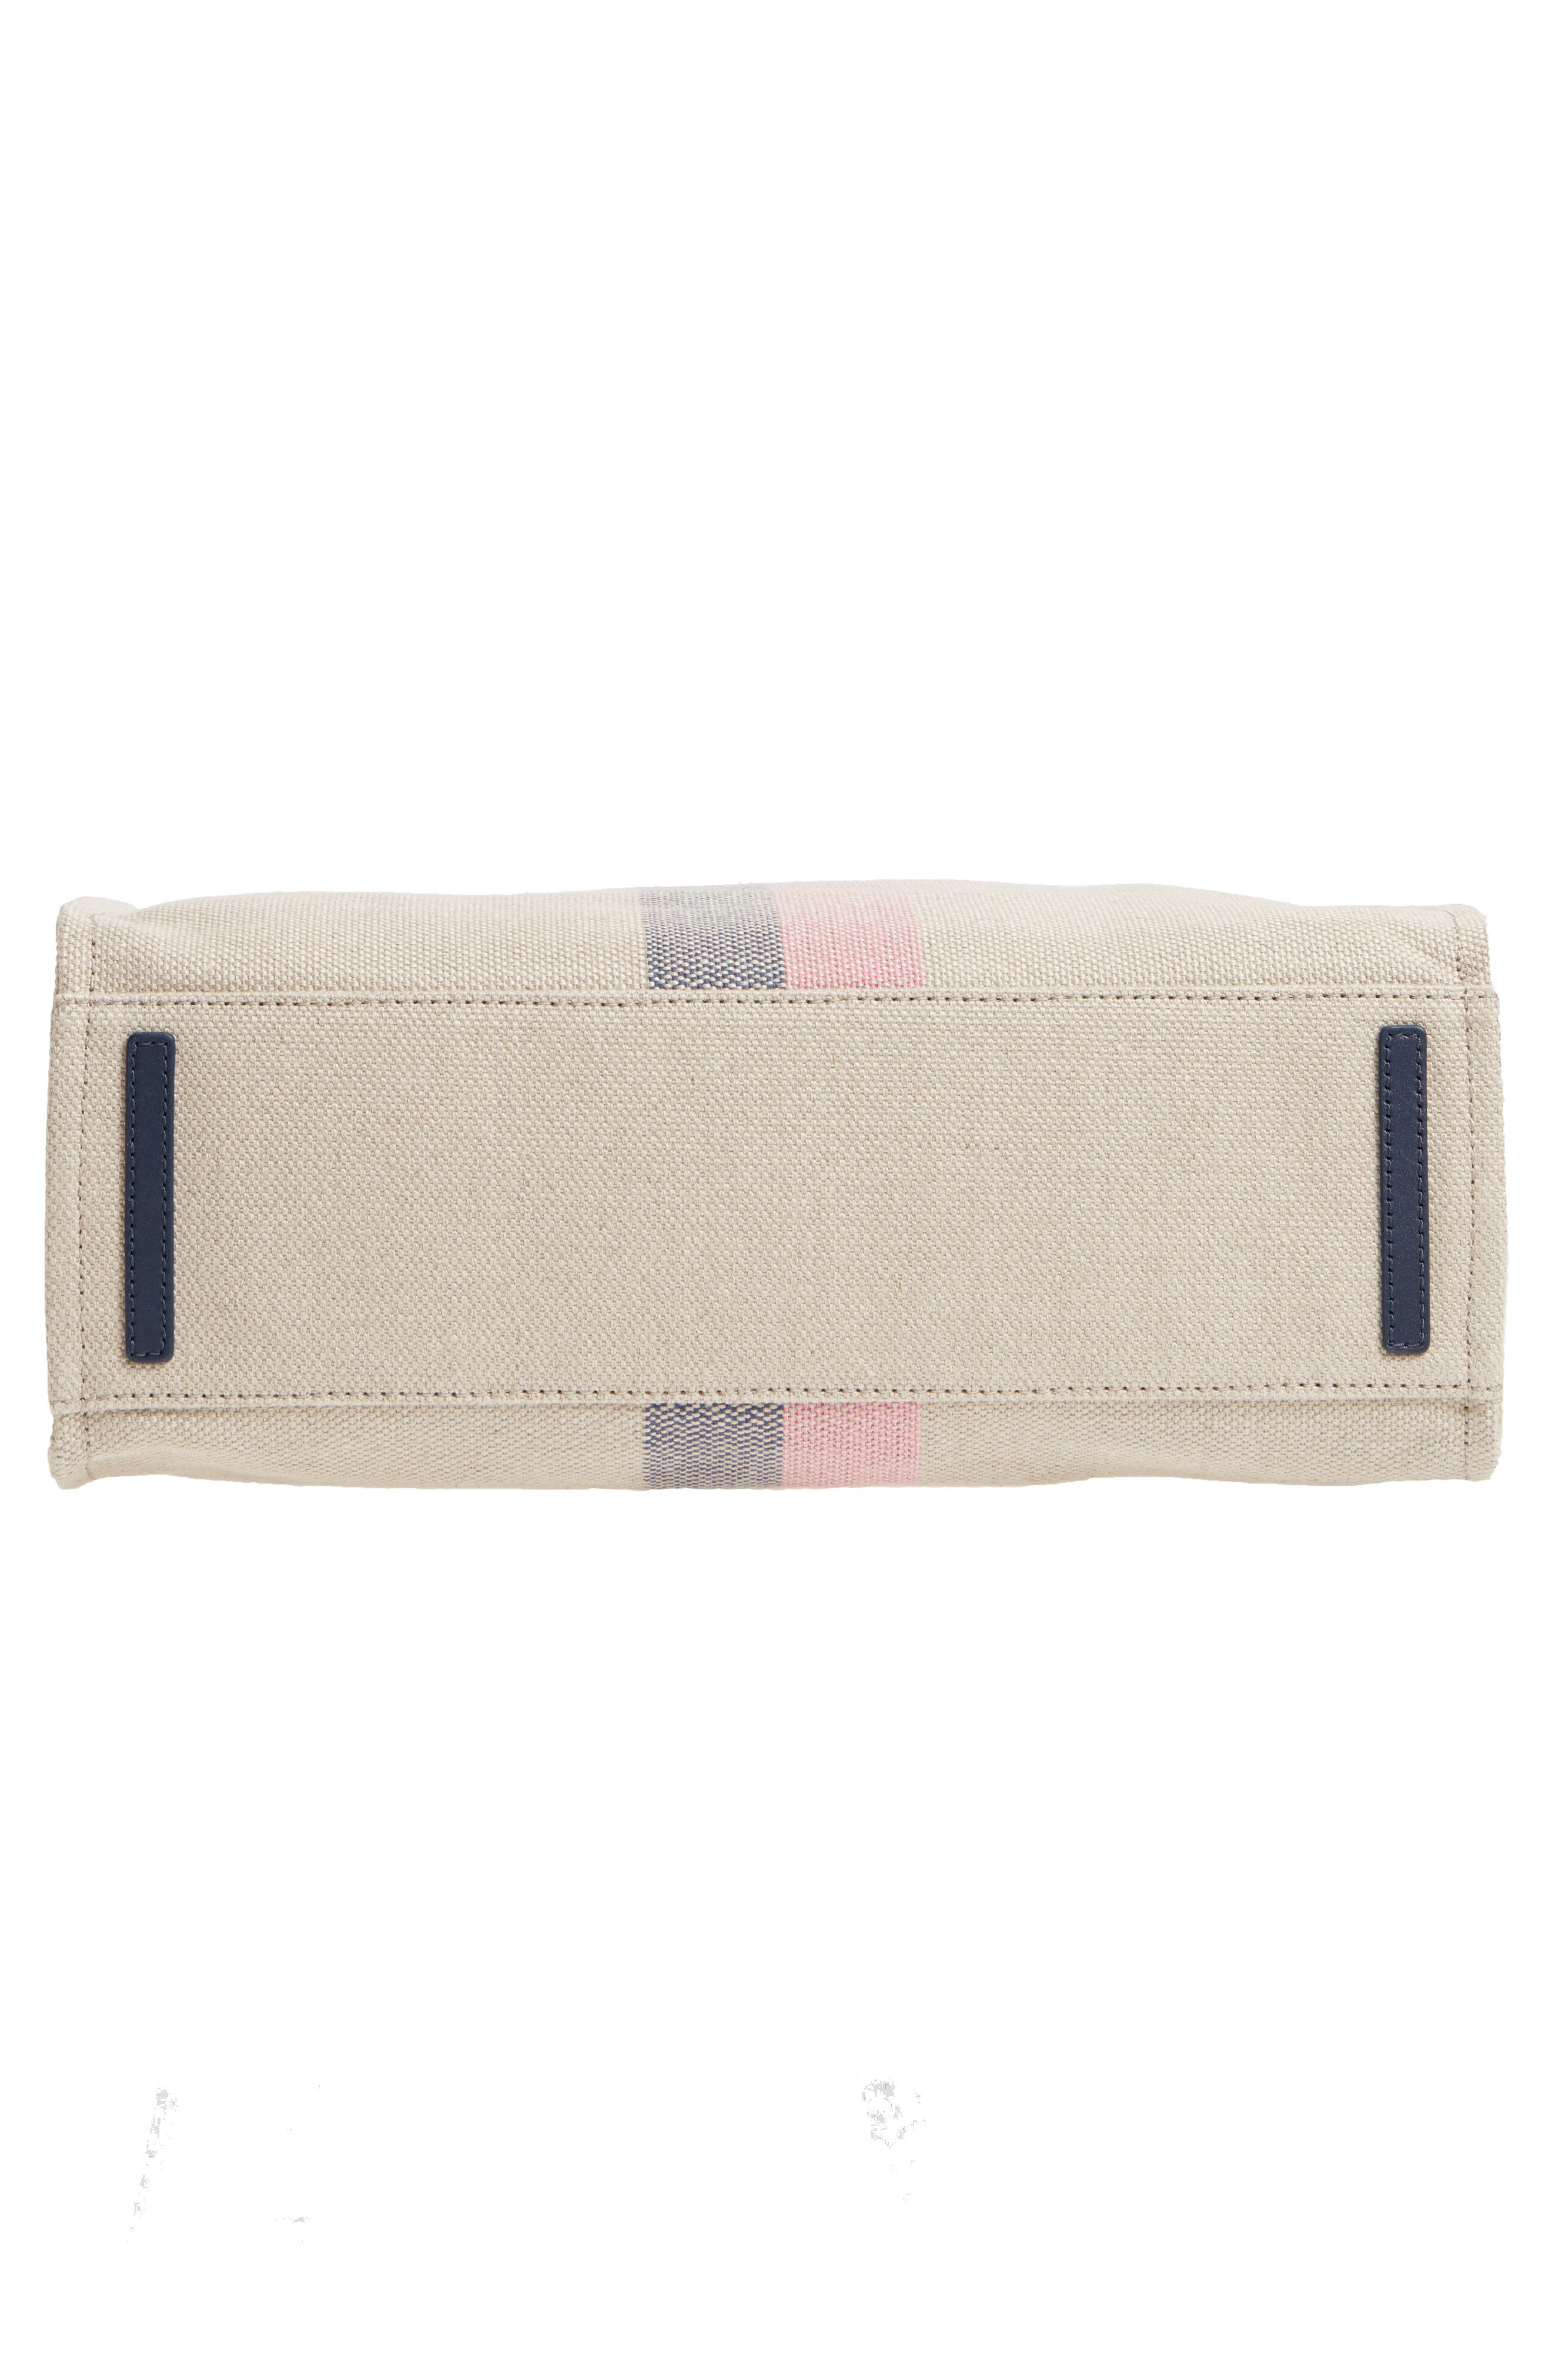 washington square - mega sam canvas satchel,                             Alternate thumbnail 6, color,                             Natural Linen/Bubble Gum/Navy